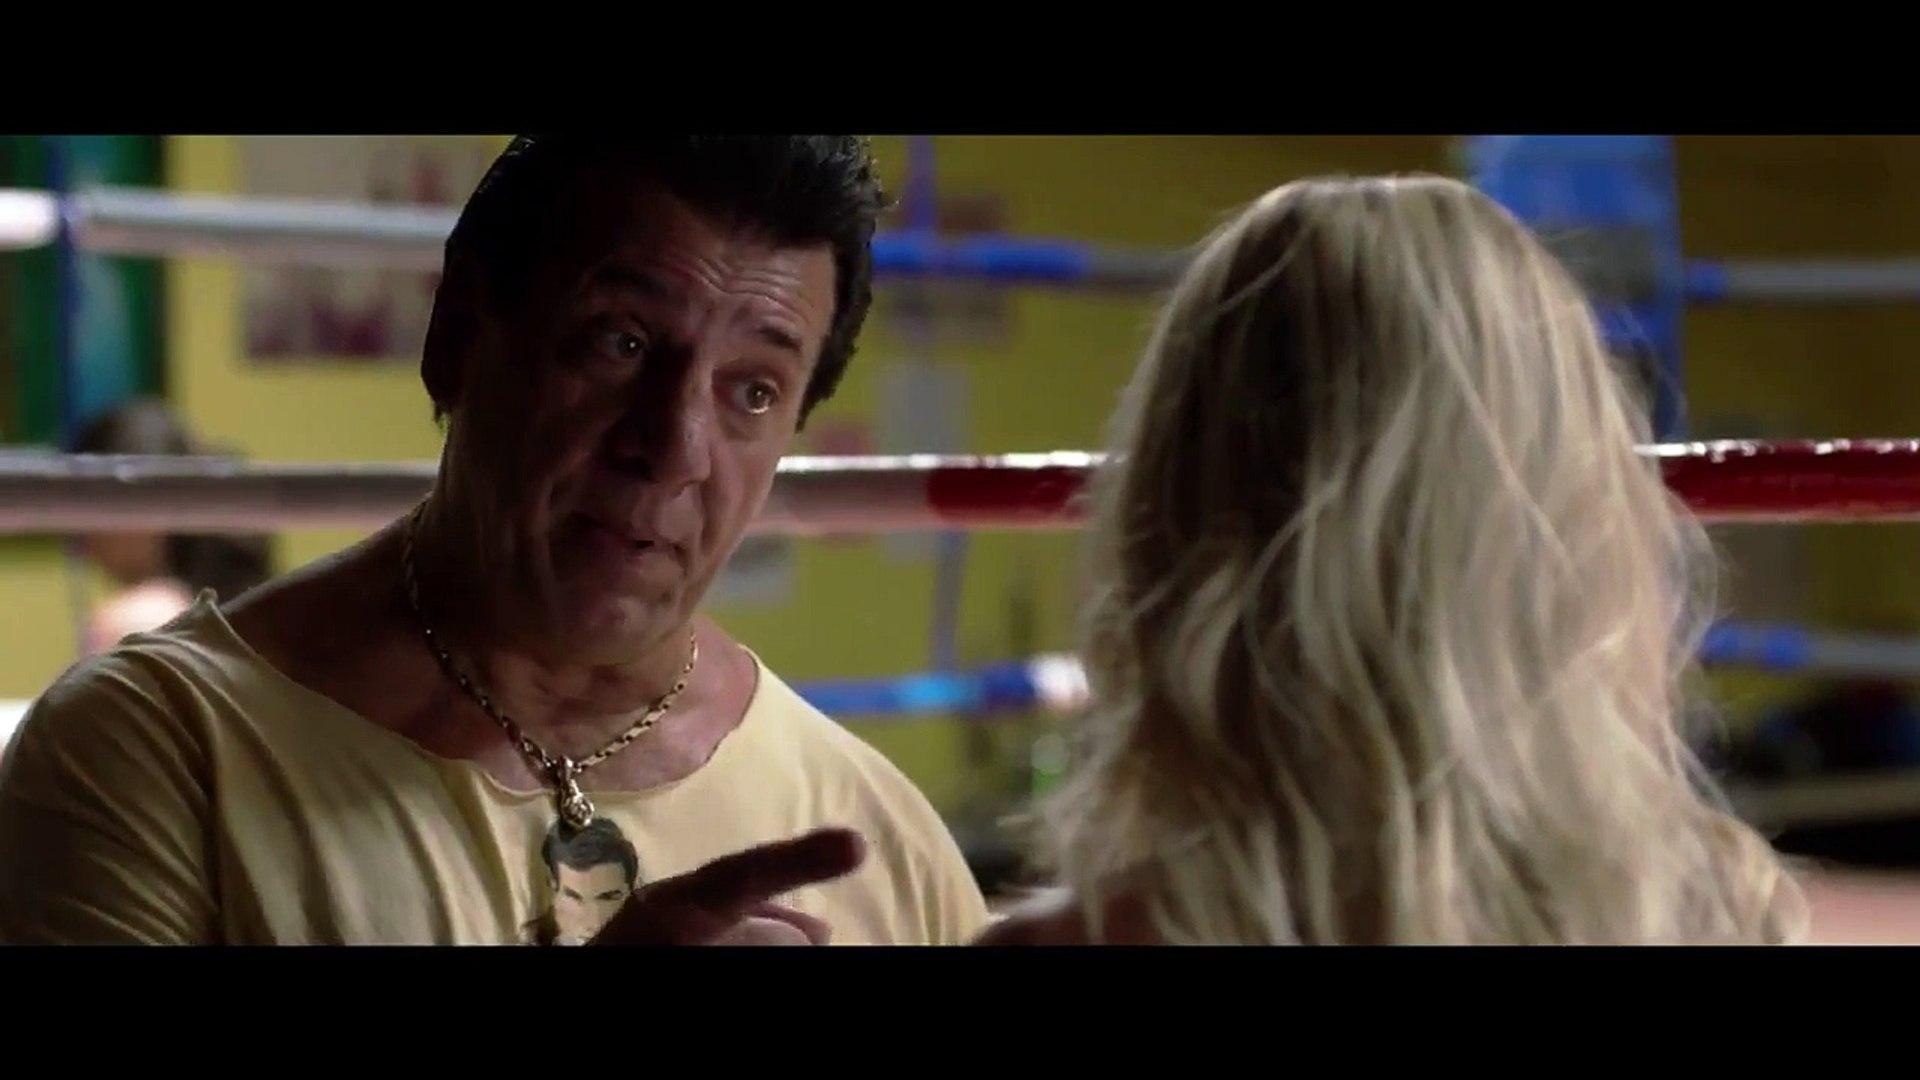 Amy Schumer Nua female fight club - amy johnston